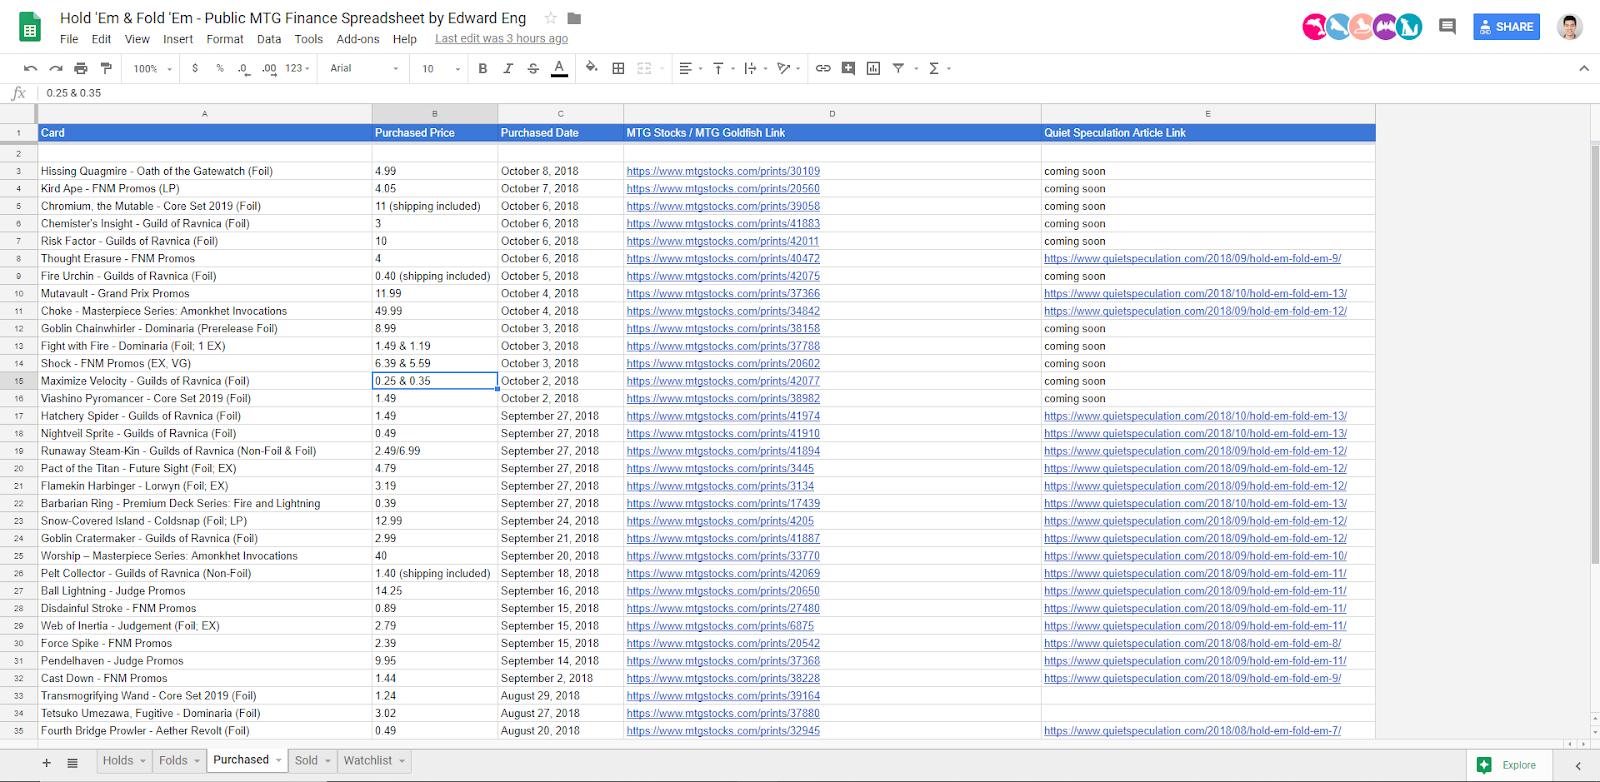 Mtg Spreadsheet Regarding Hold 'em  Fold 'em #14  Quiet Speculation